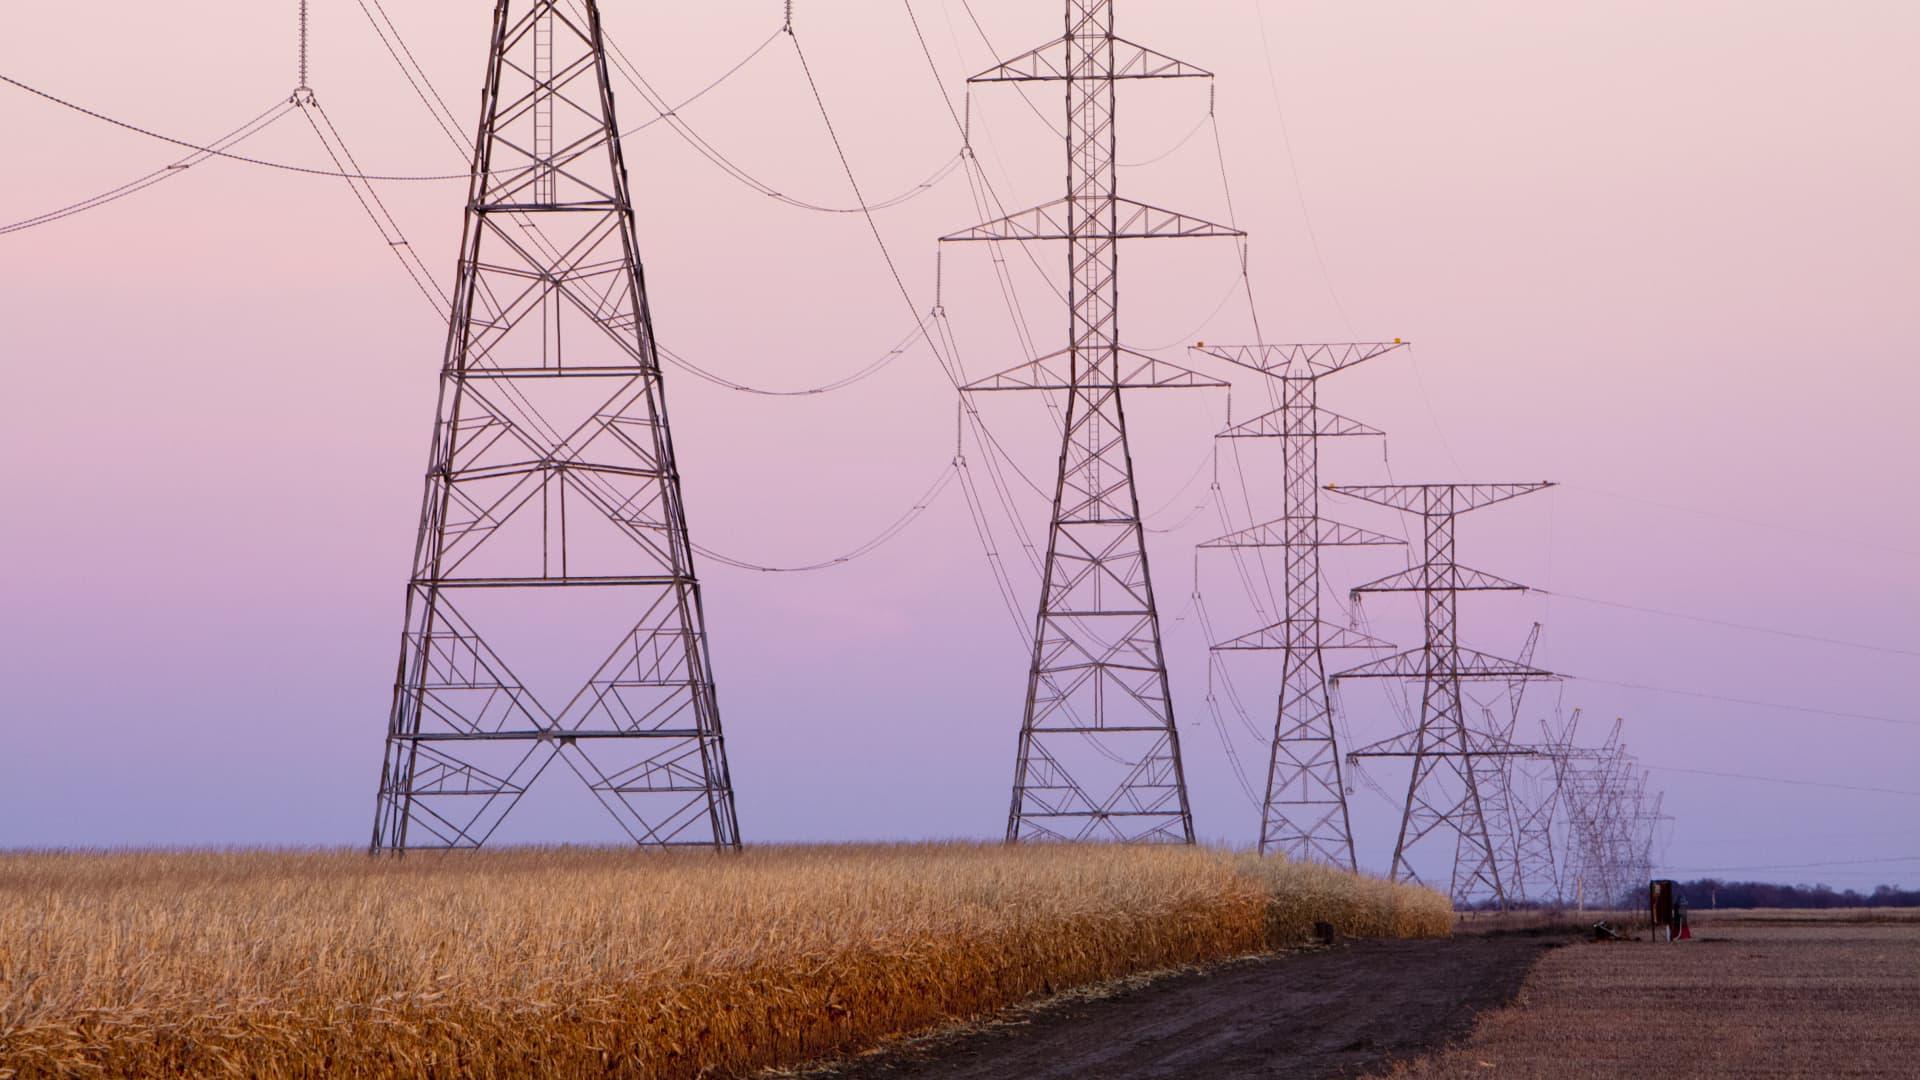 High capacity electrical transmission lines in rural Nebraska, USA.